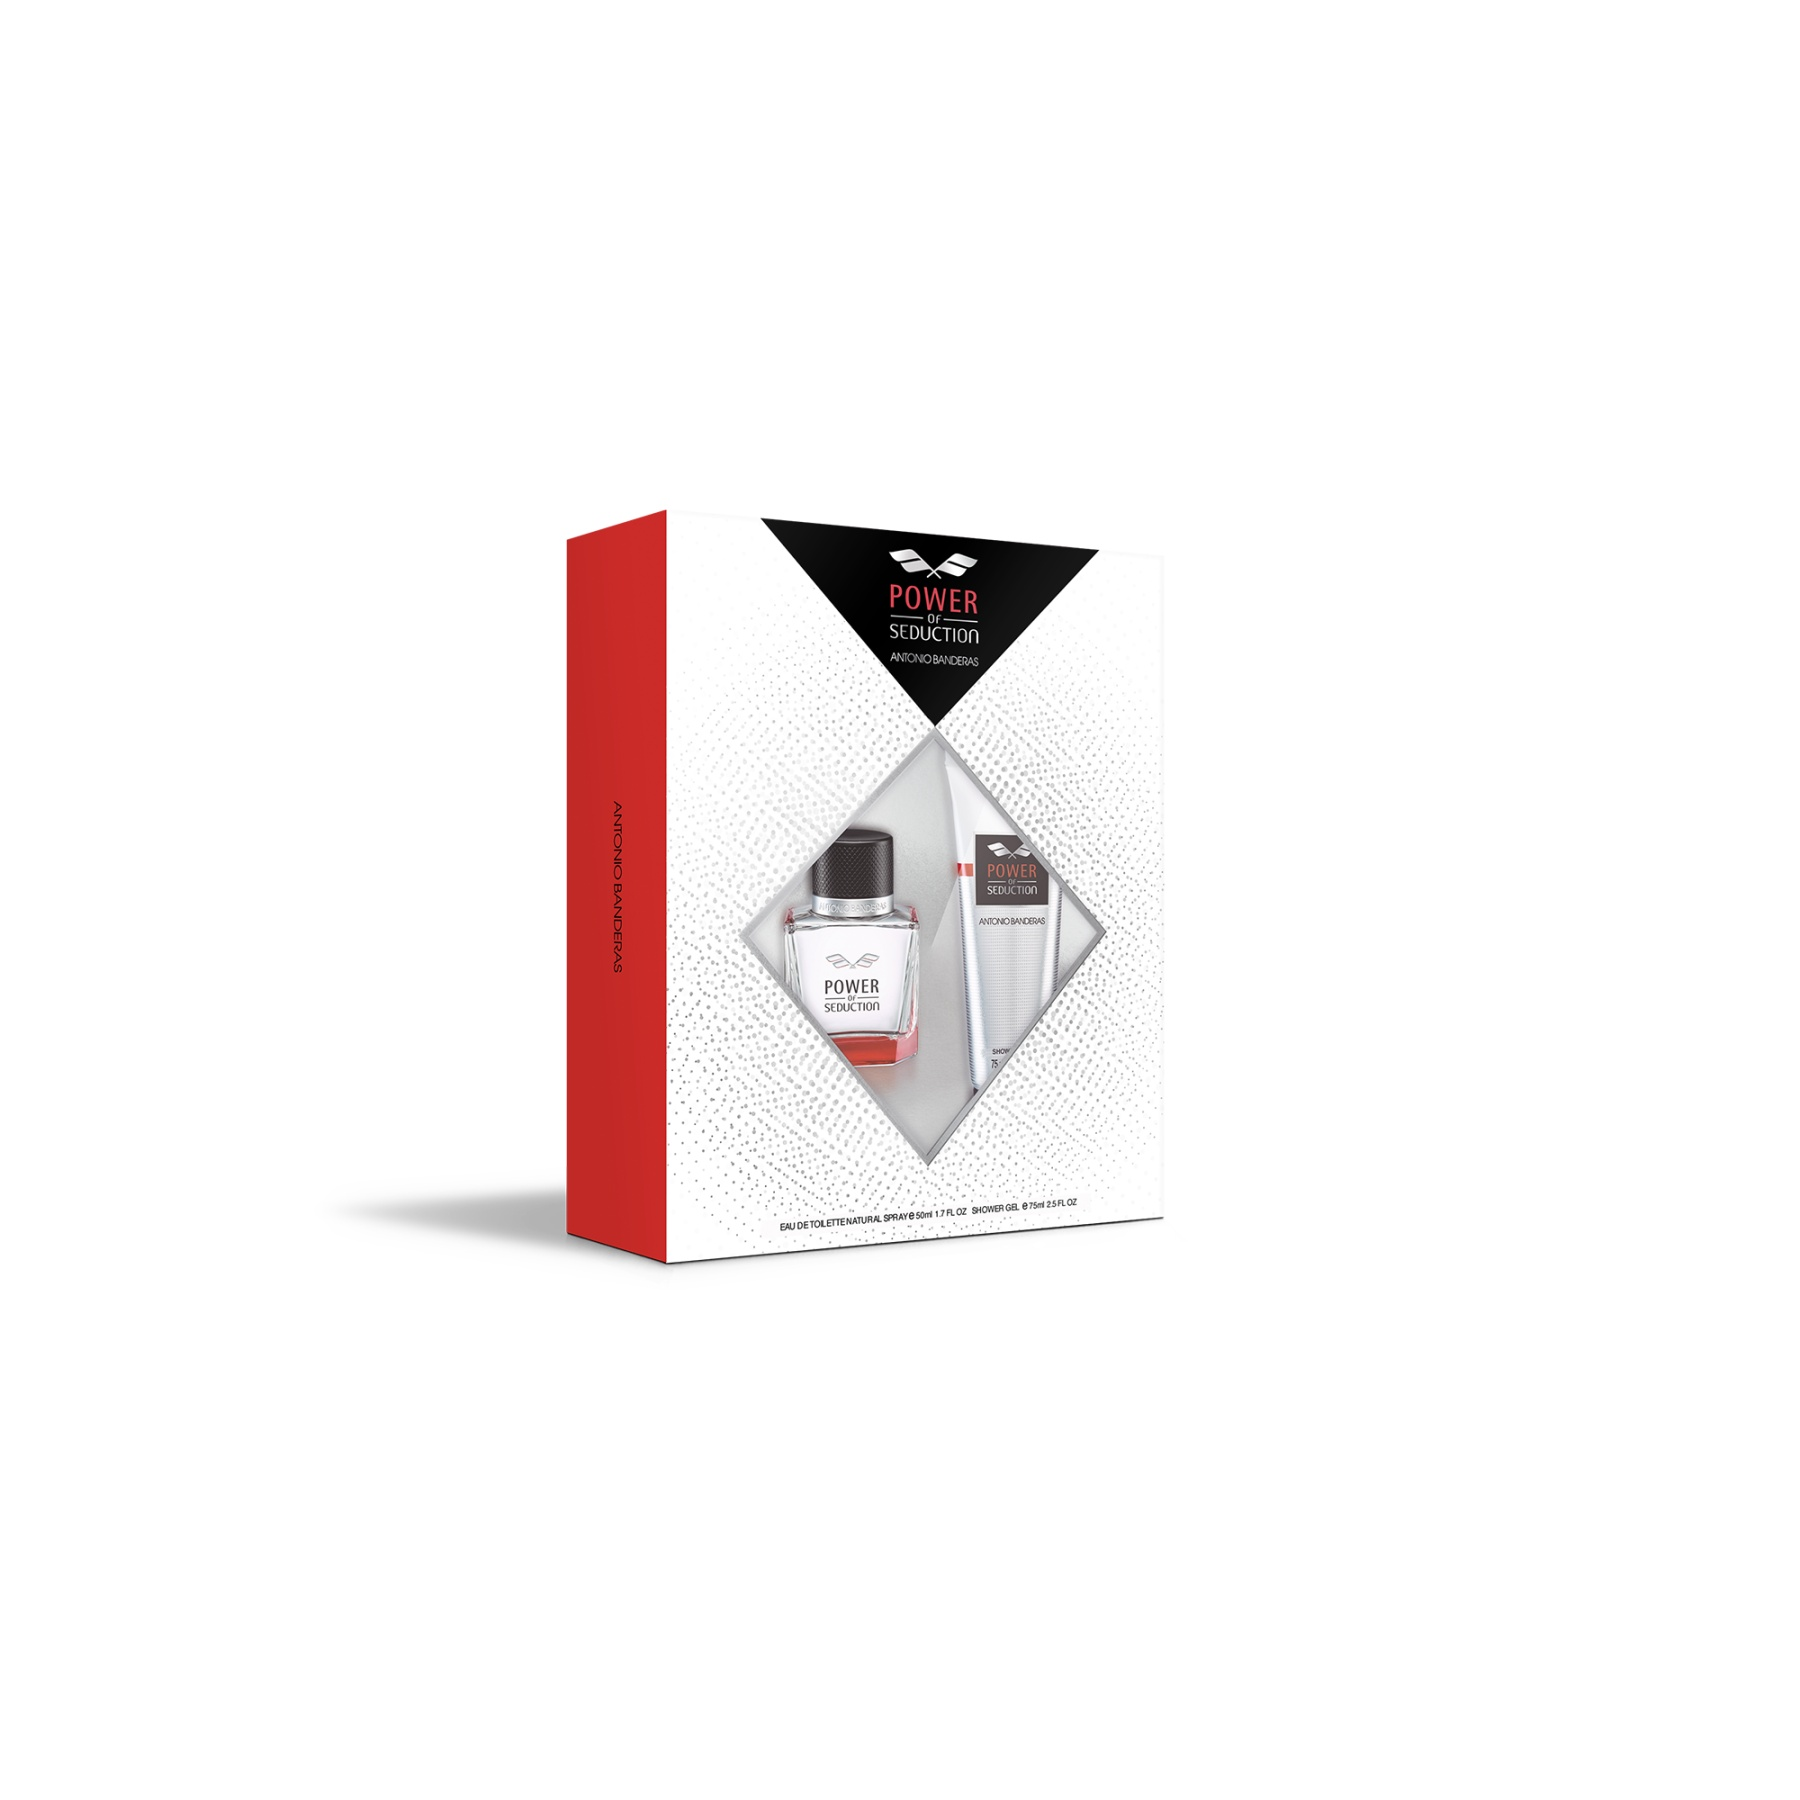 Perfume Antonio Banderas Power Of Seduction M Set Eau De Toilette Perfume 50 Ml + Shower Gel 75 Ml